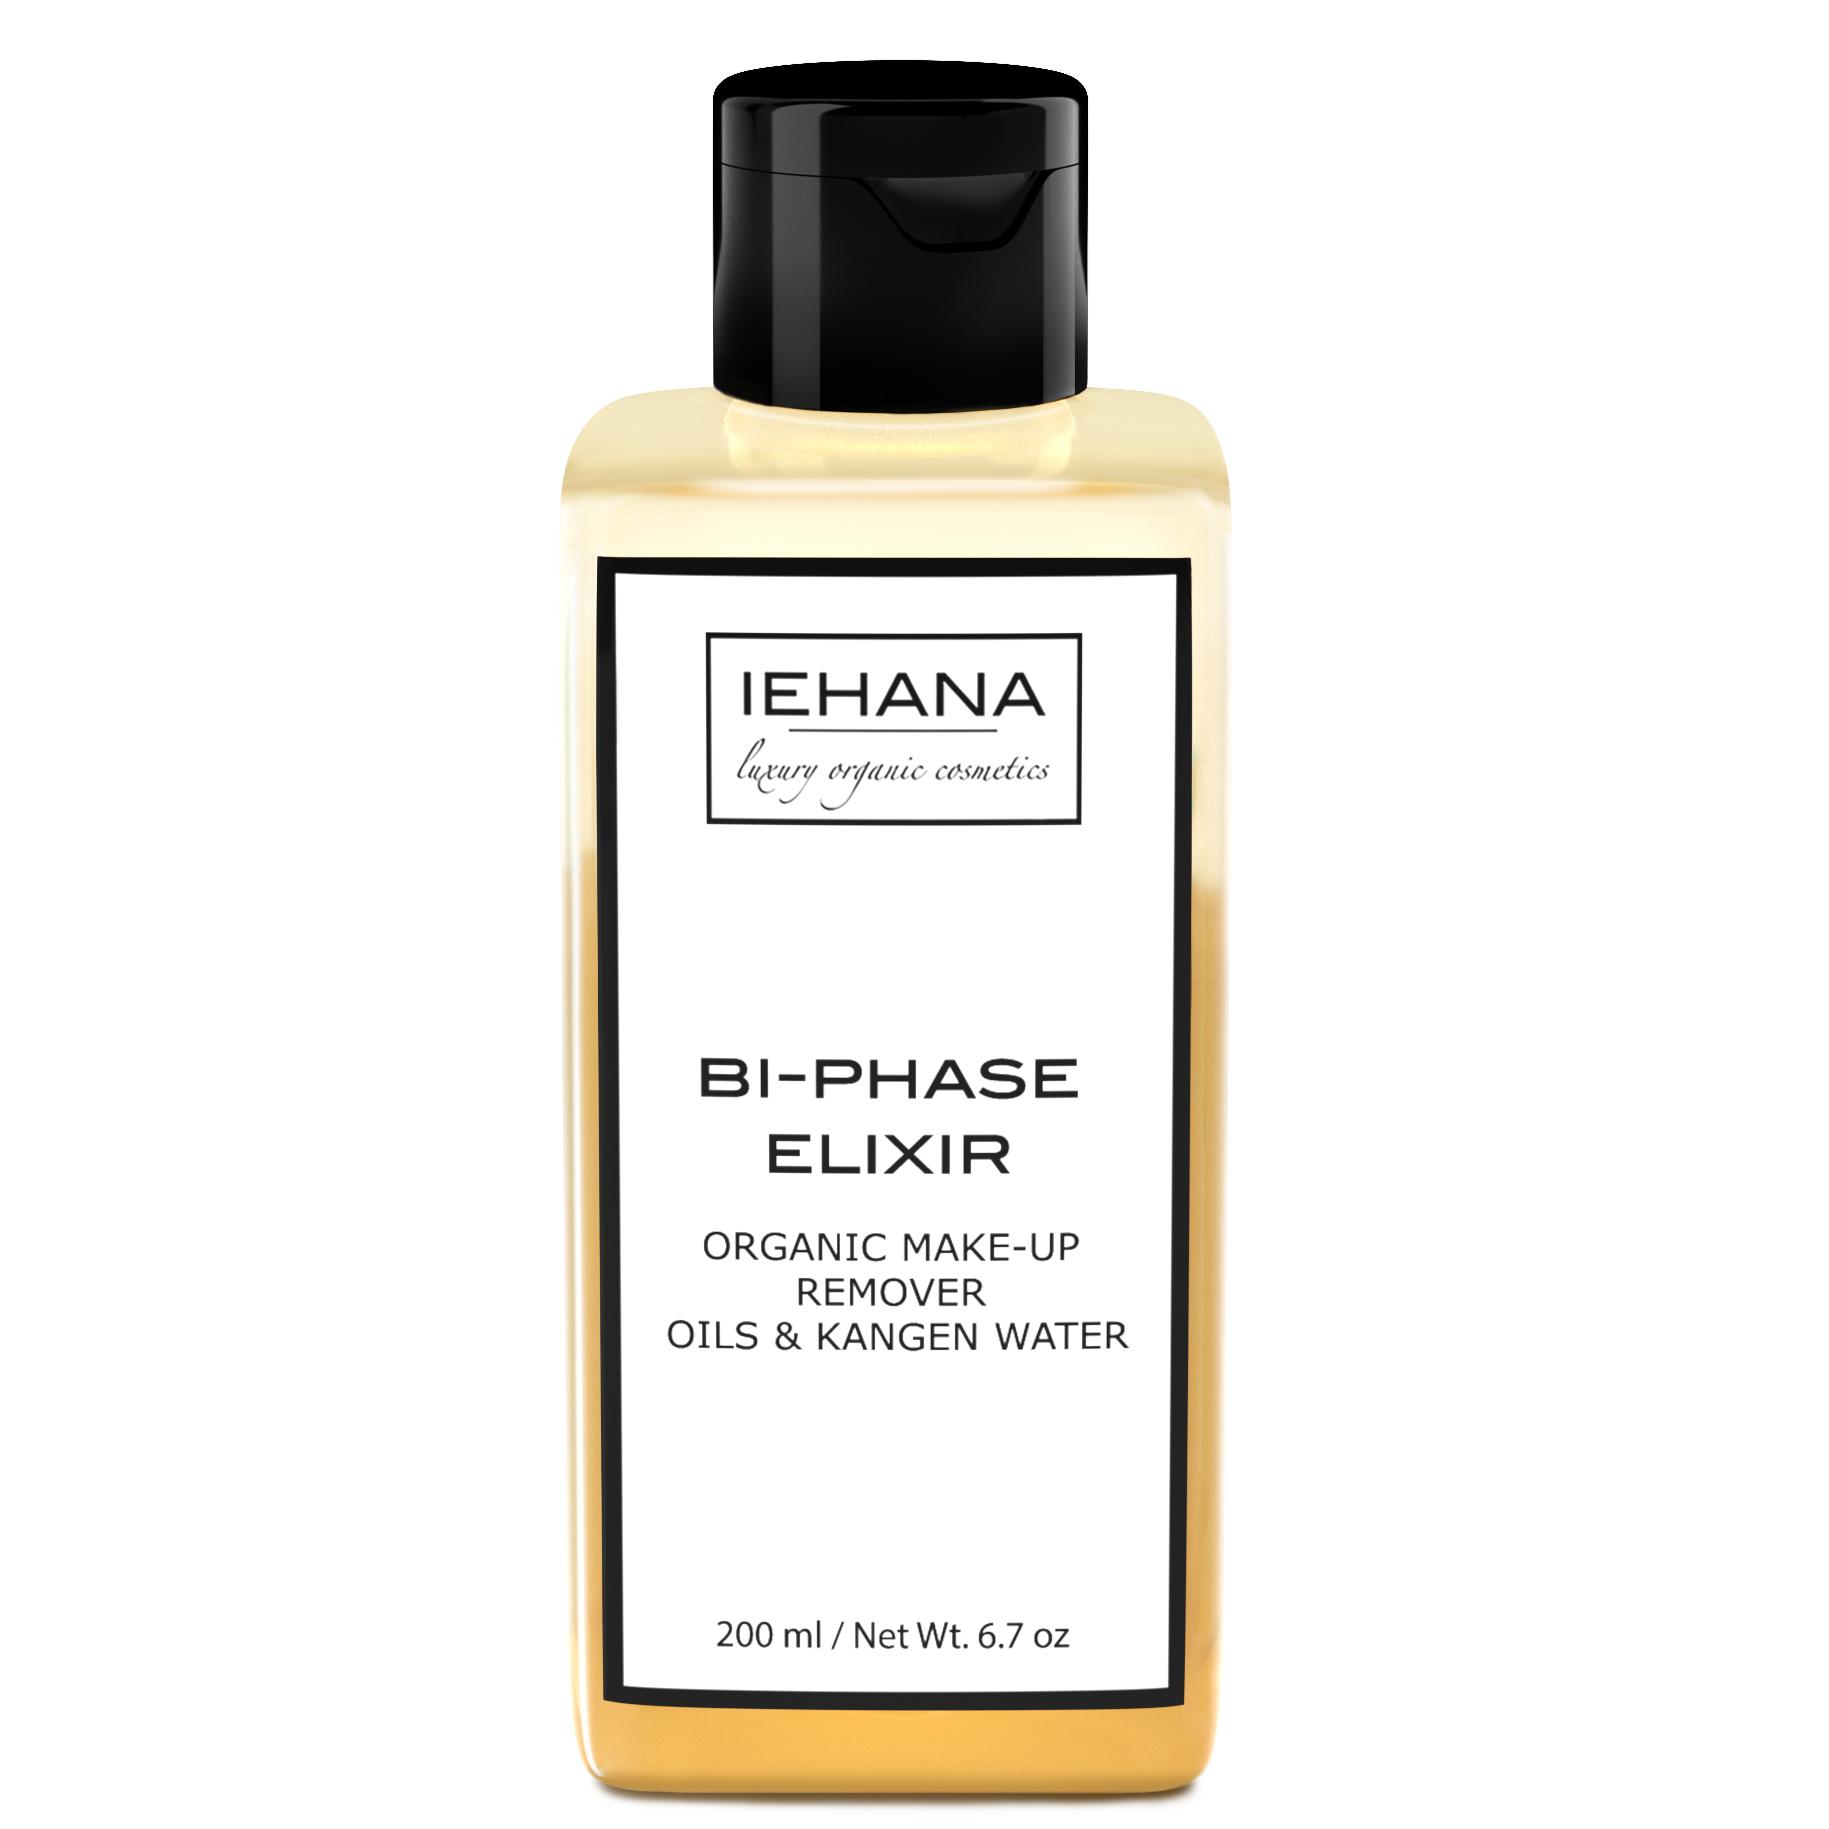 Iehana - BI-PHASE ELIXIR Demachiant bifazic